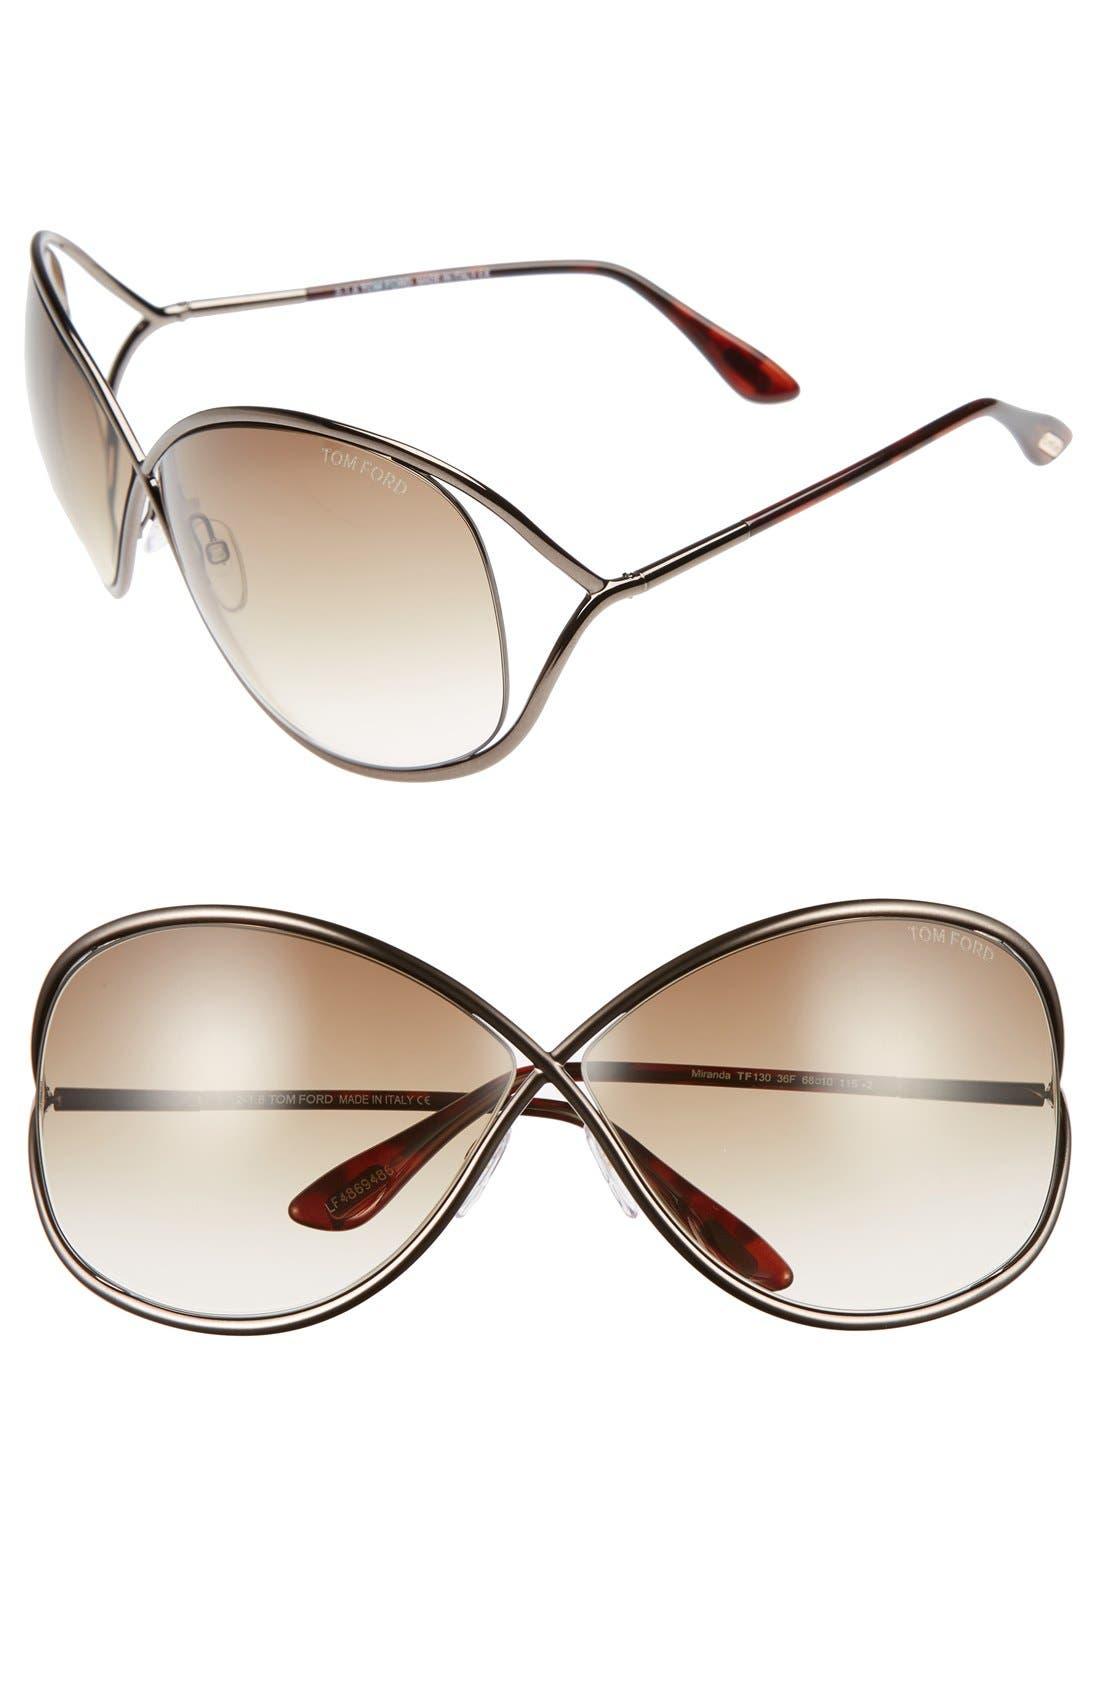 Alternate Image 1 Selected - Tom Ford Miranda 68mm Open Temple Oversize Metal Sunglasses